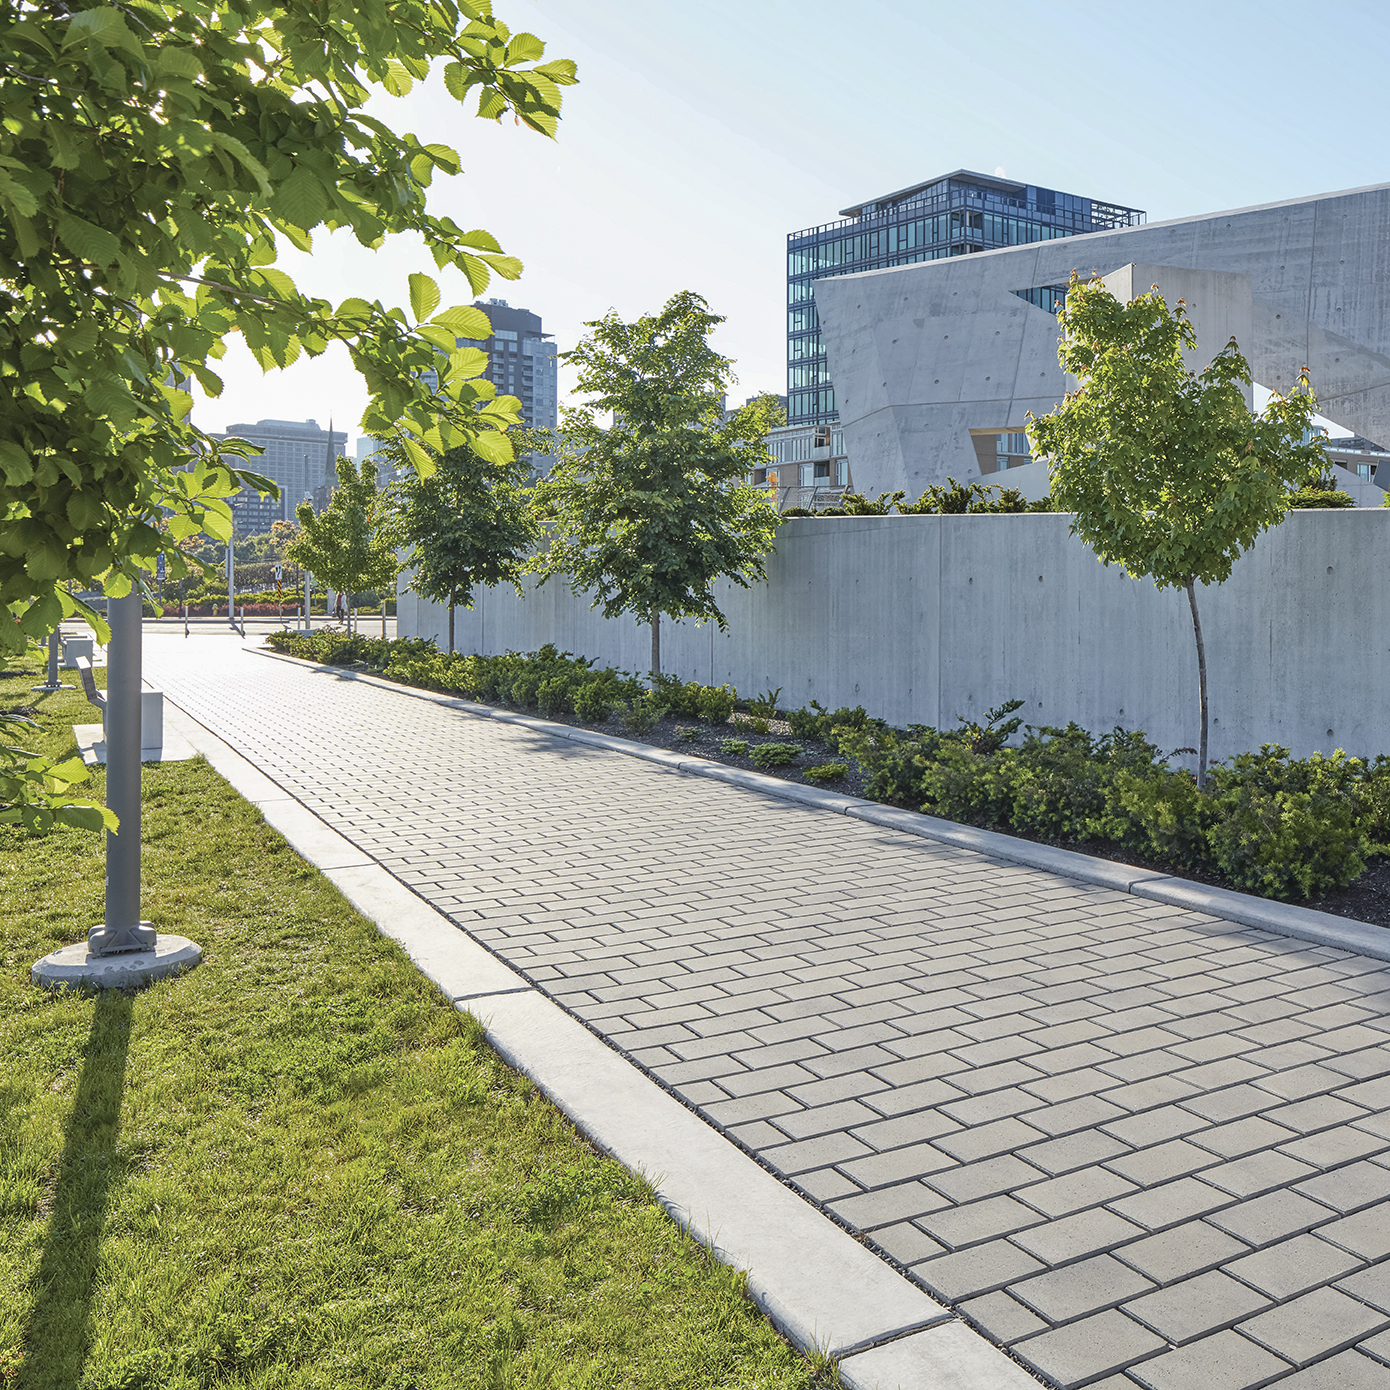 Walkway-paving-stones-grass-trees